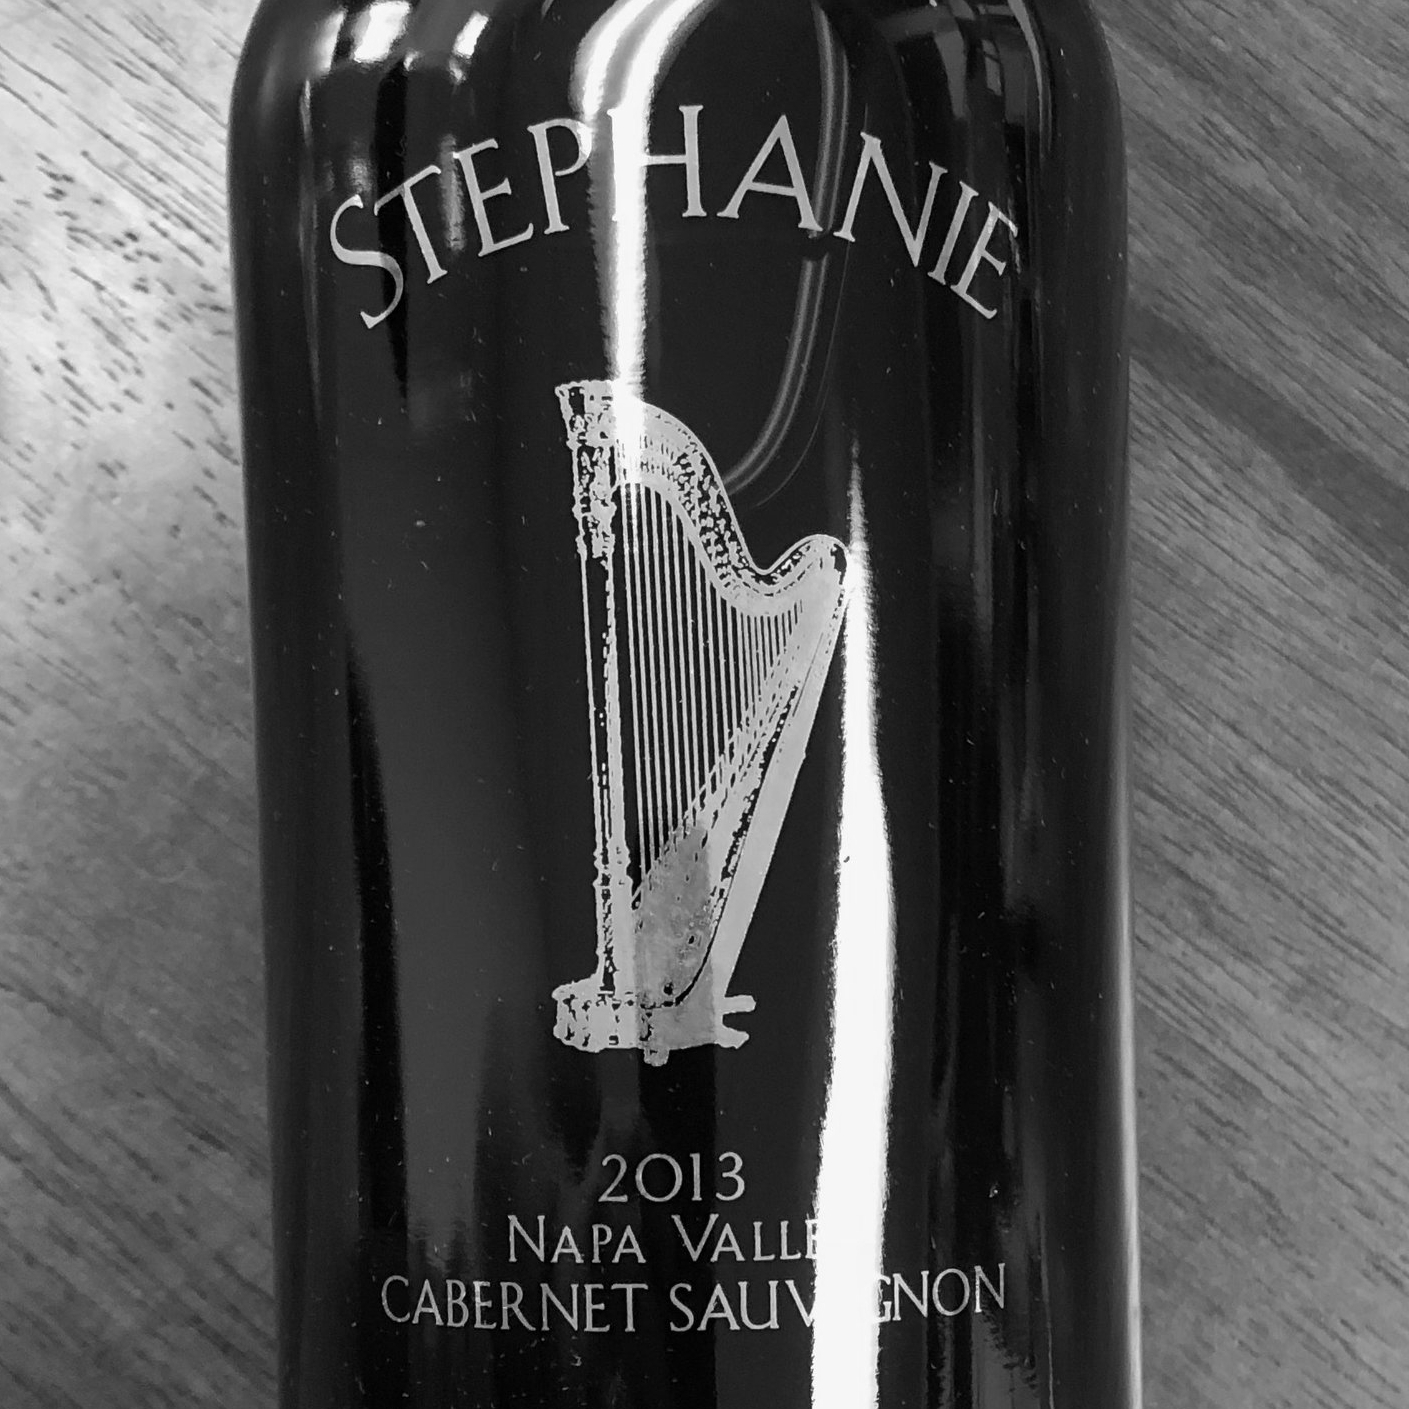 Stephanie - by Hestan Vineyards